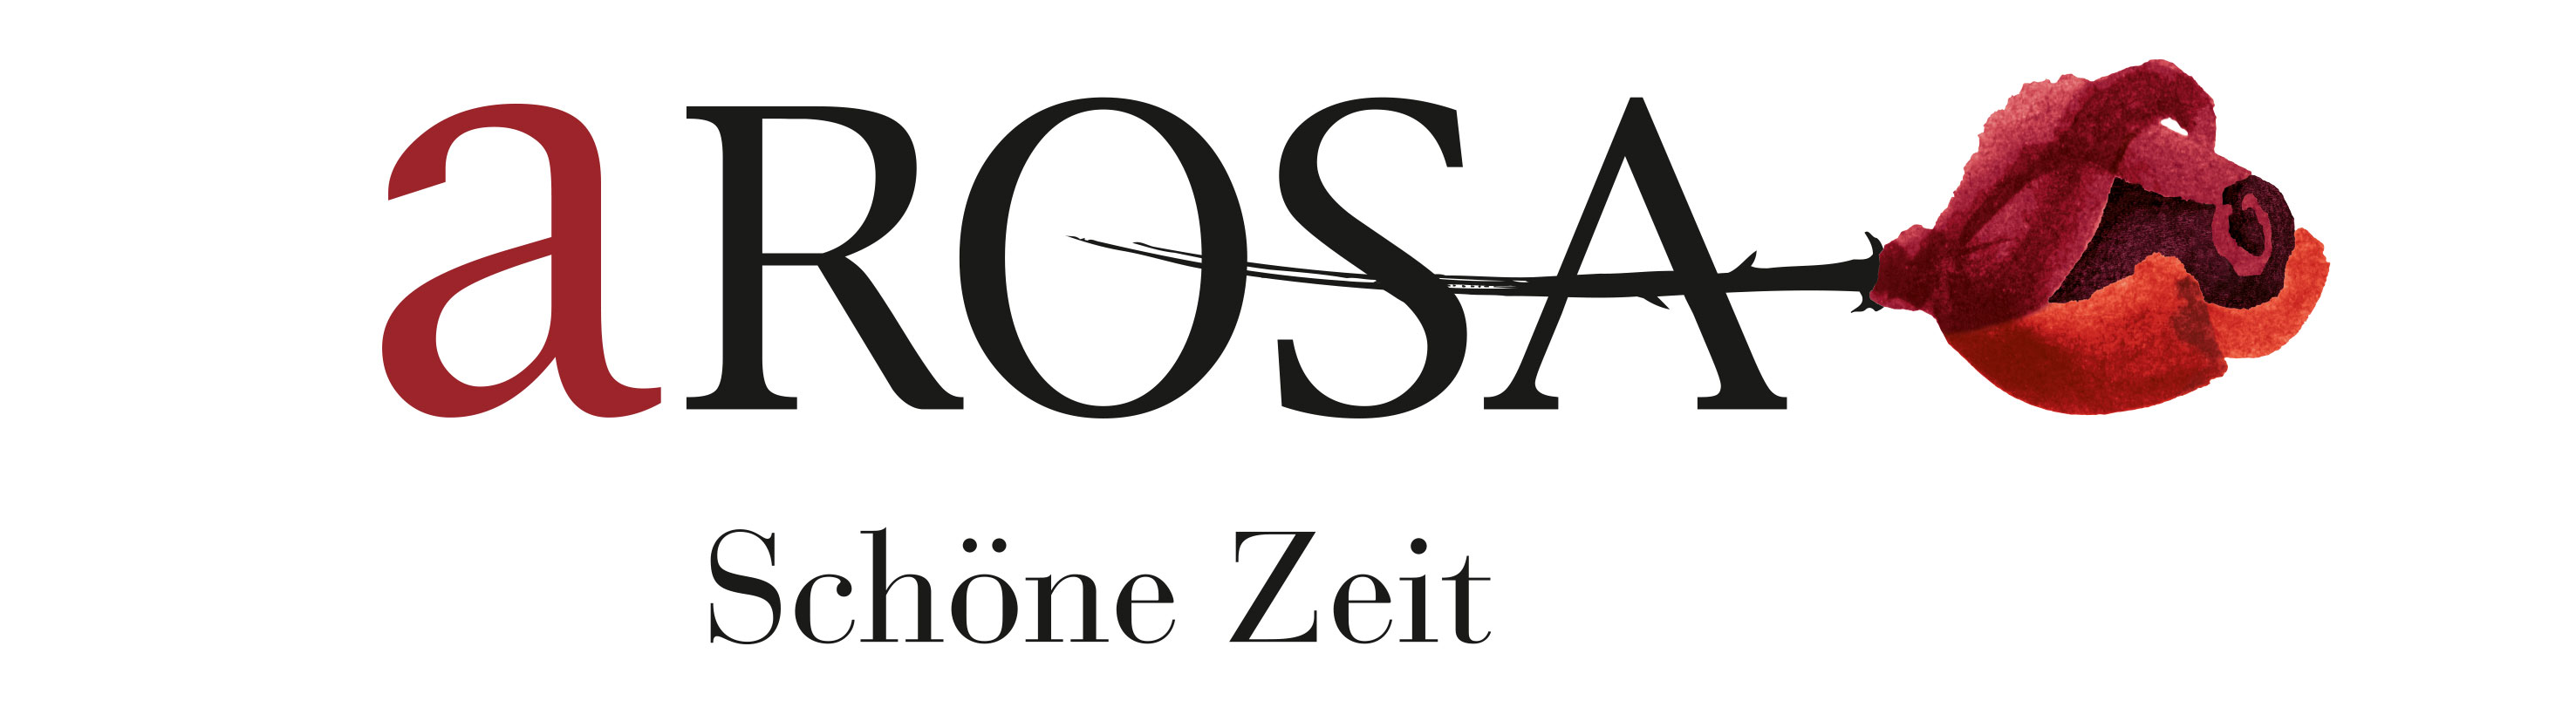 SchoeneZeit_WEB_4c